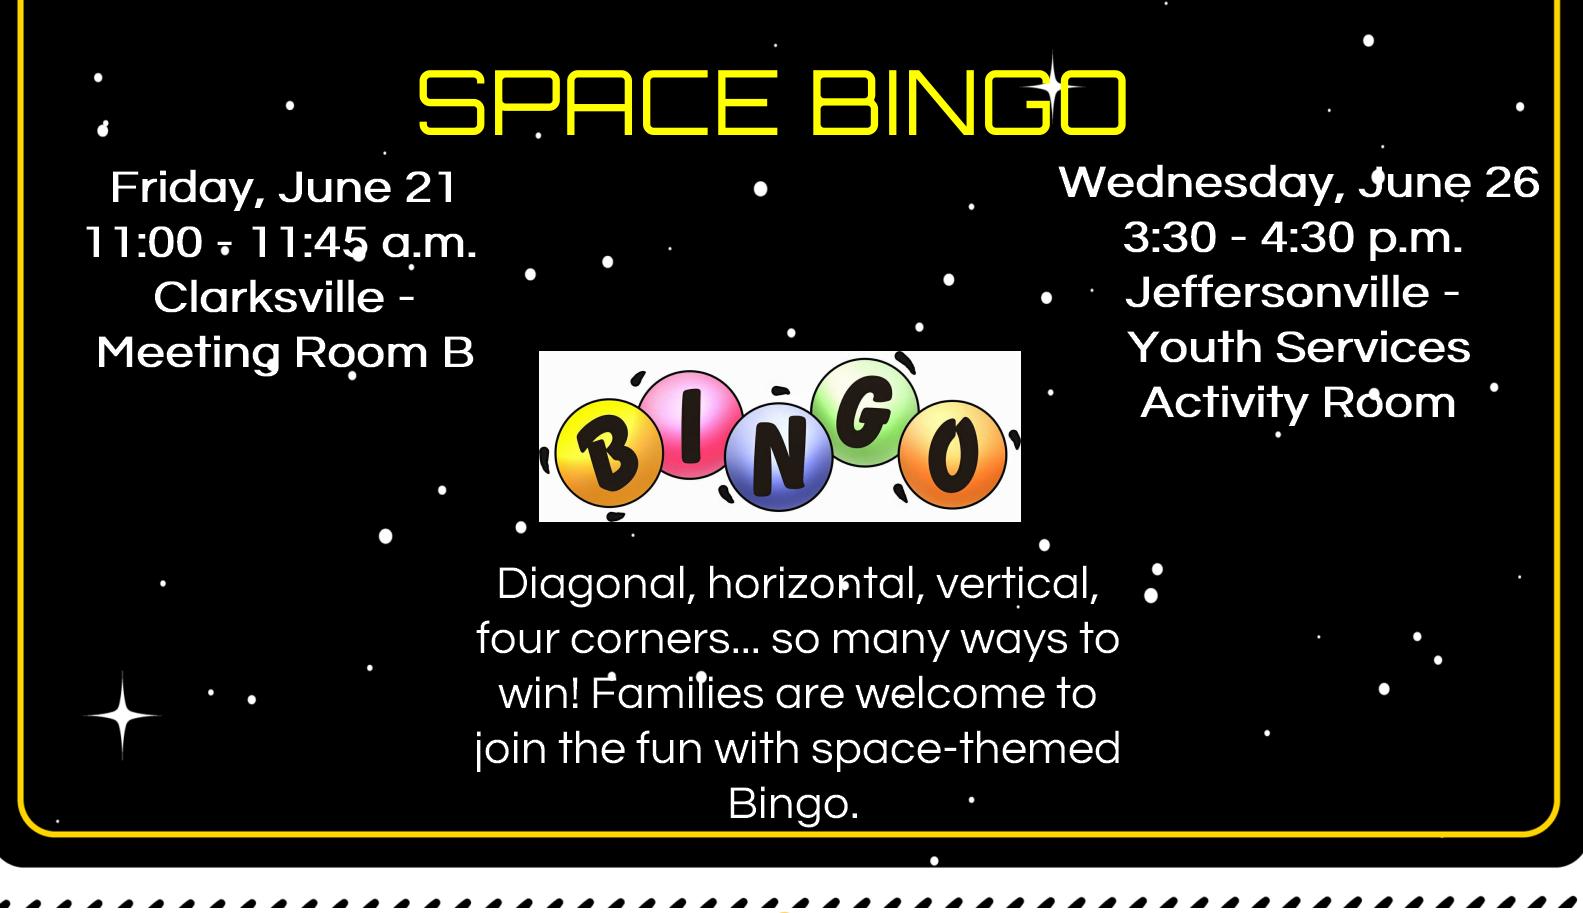 Flyer for Space Bingo